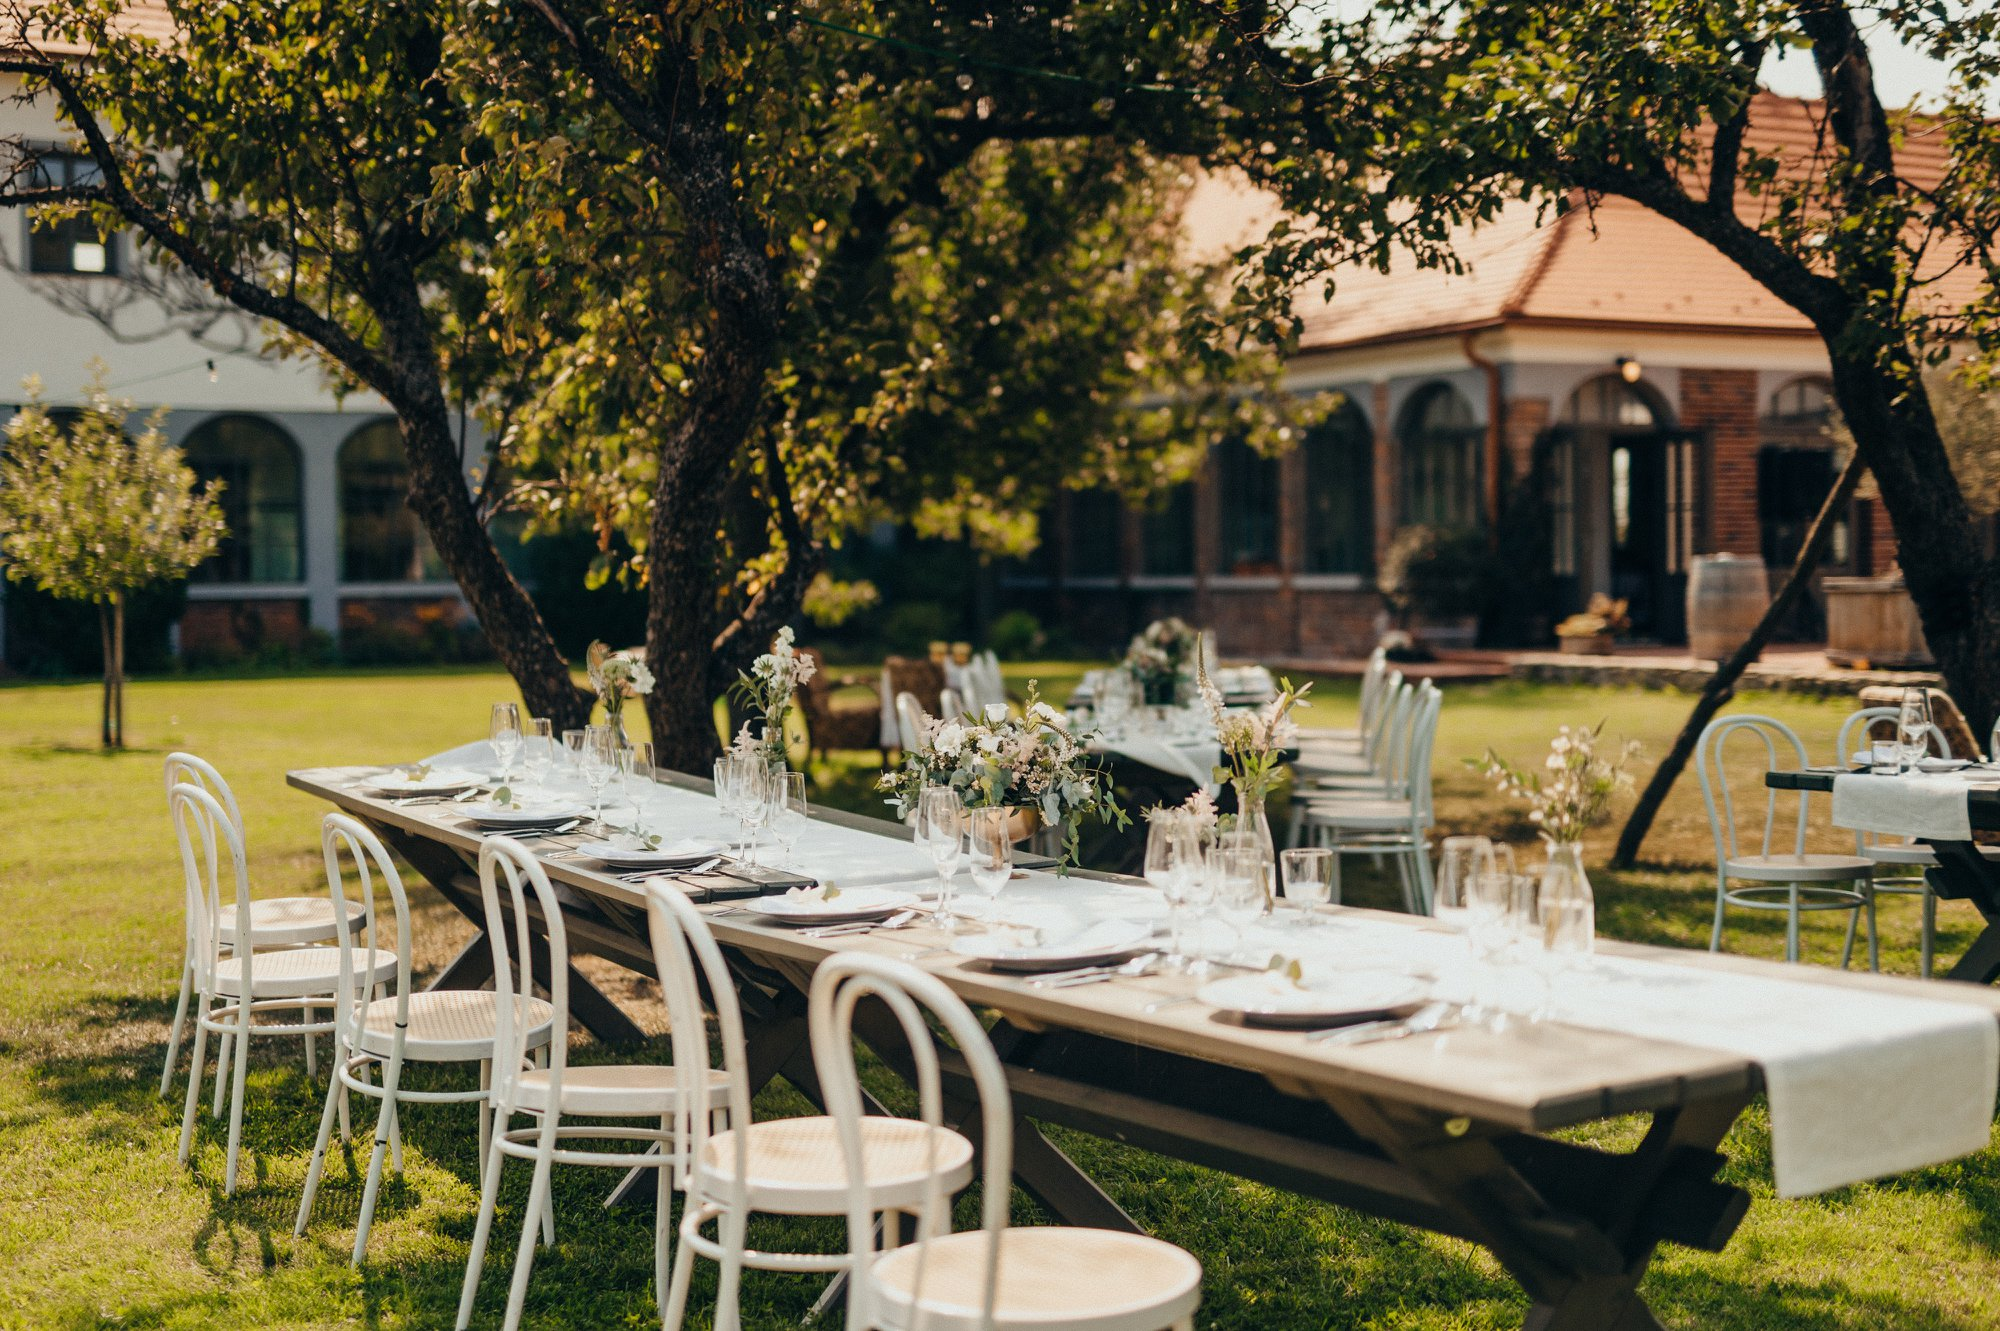 svadba Wiegerova vila na svadbujpg